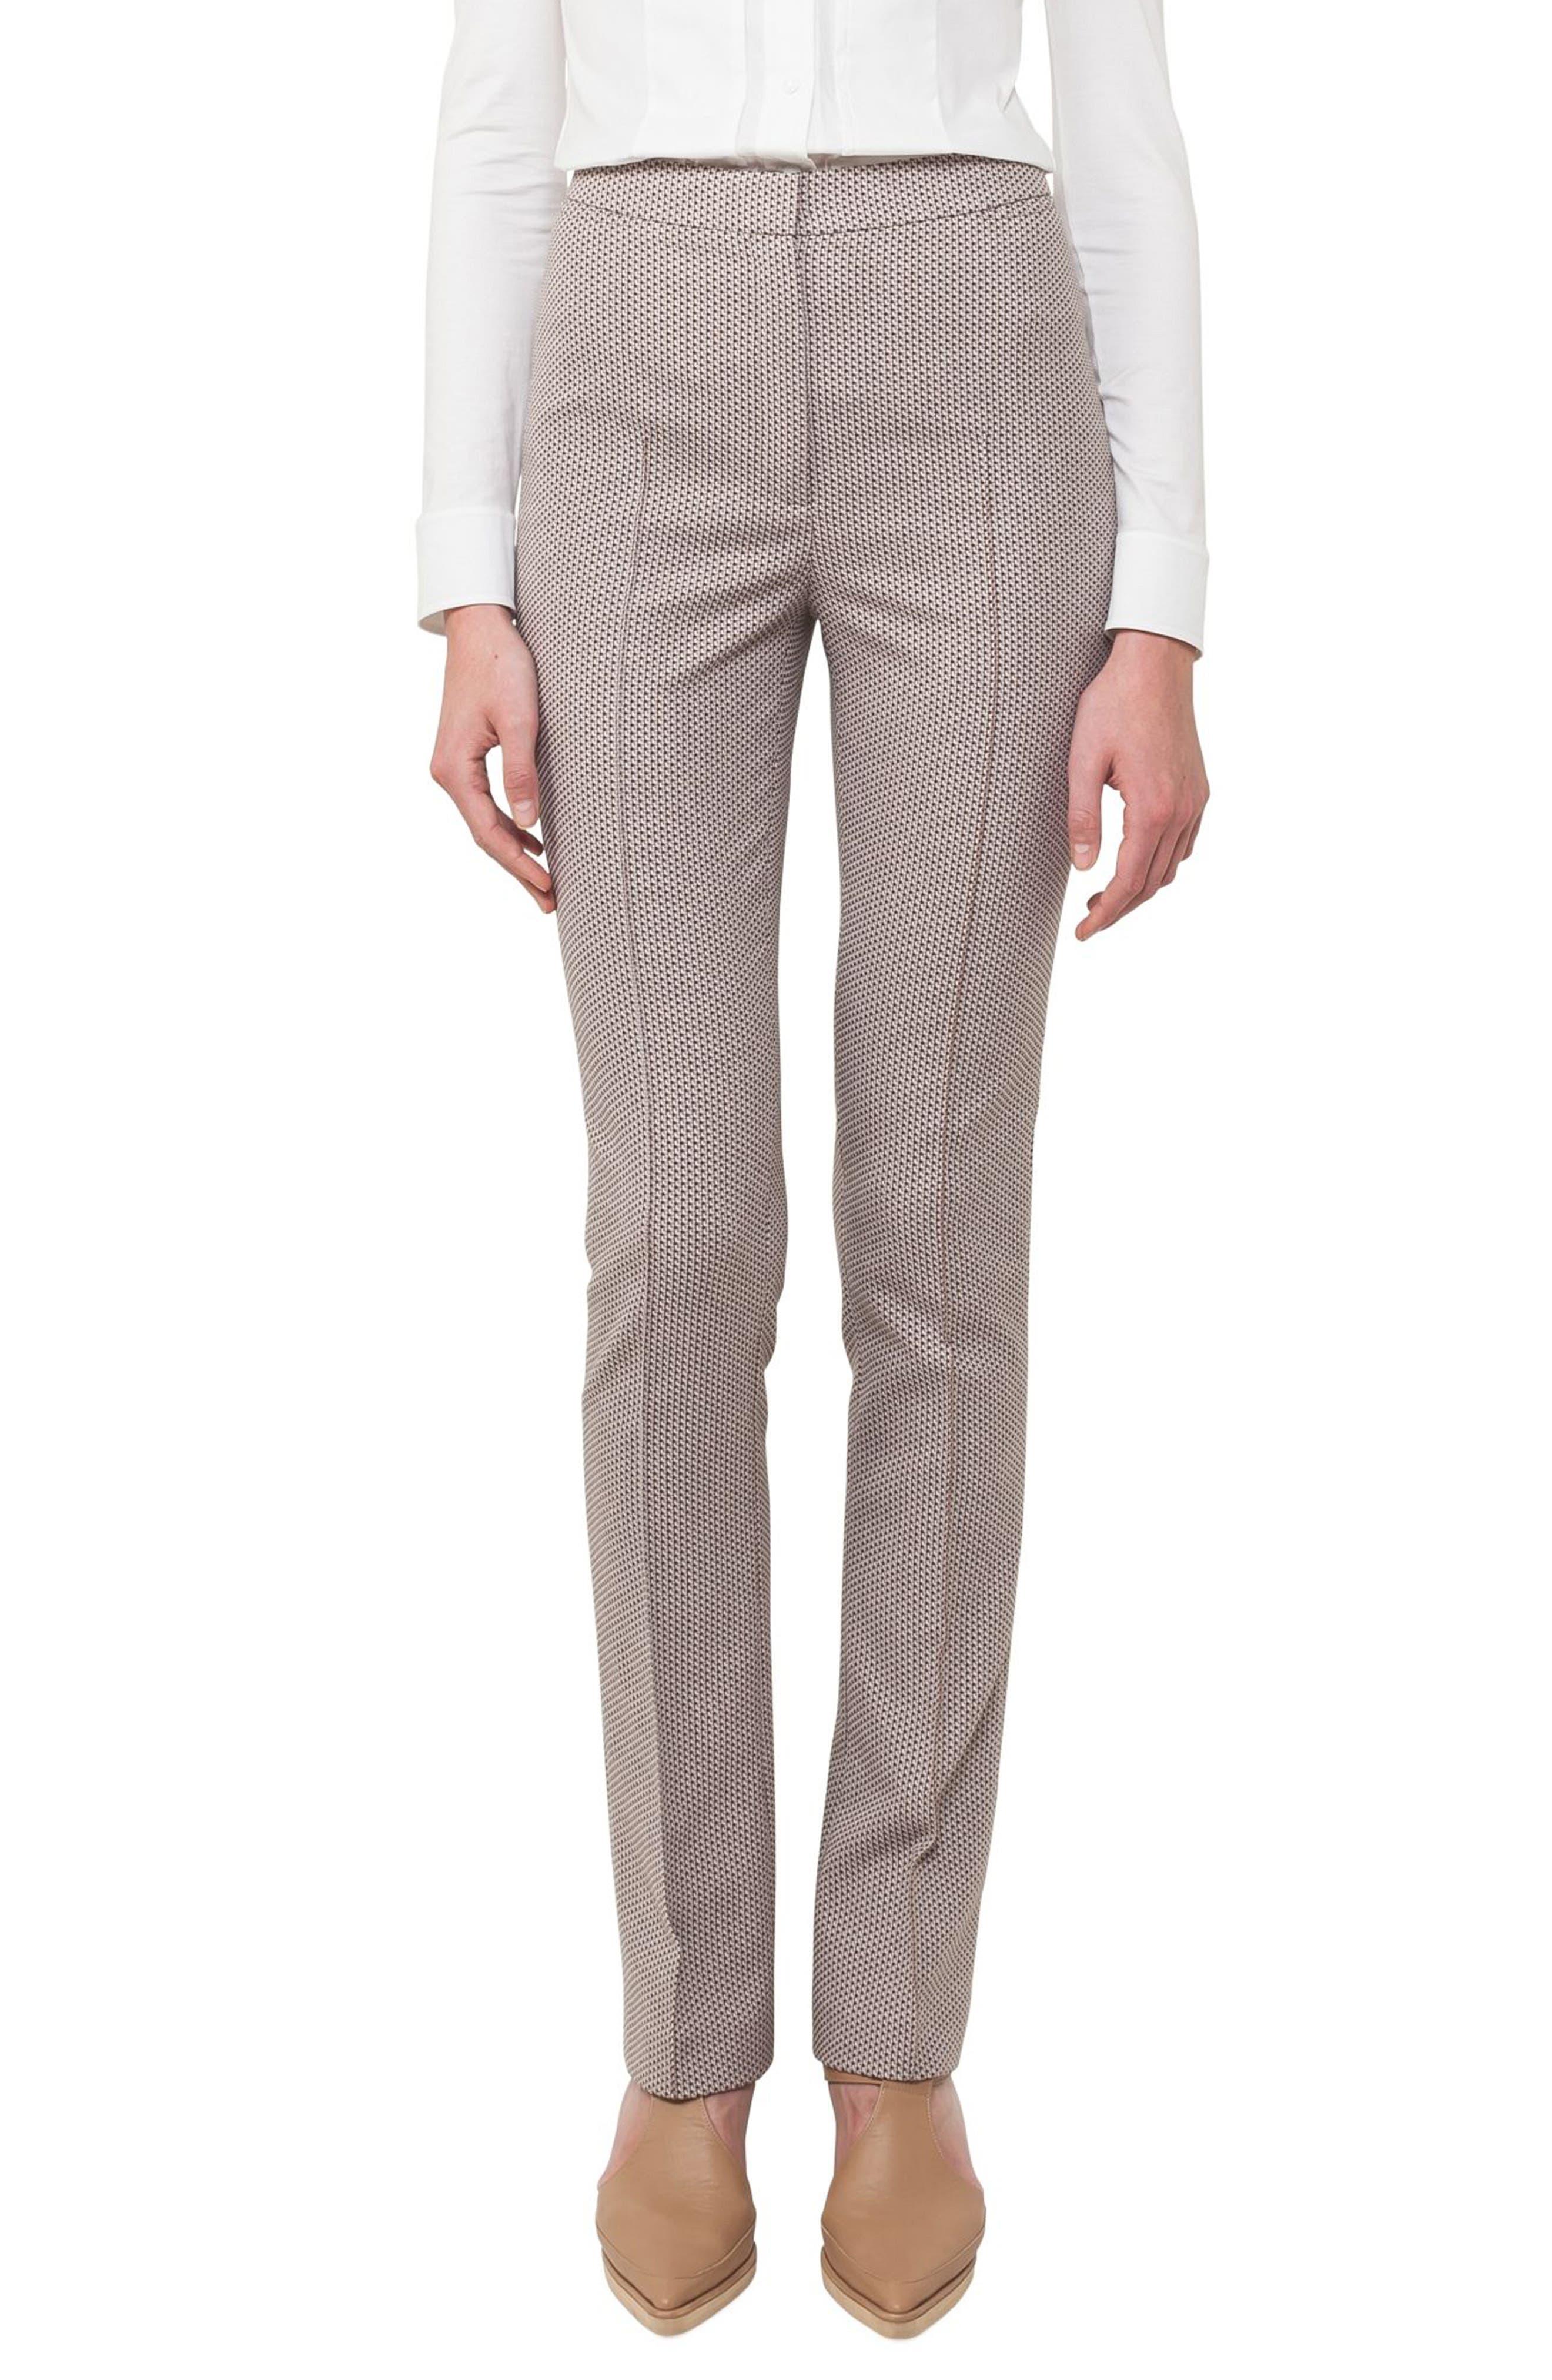 Claire Stretch Cotton Pants,                         Main,                         color, Taupe Multi